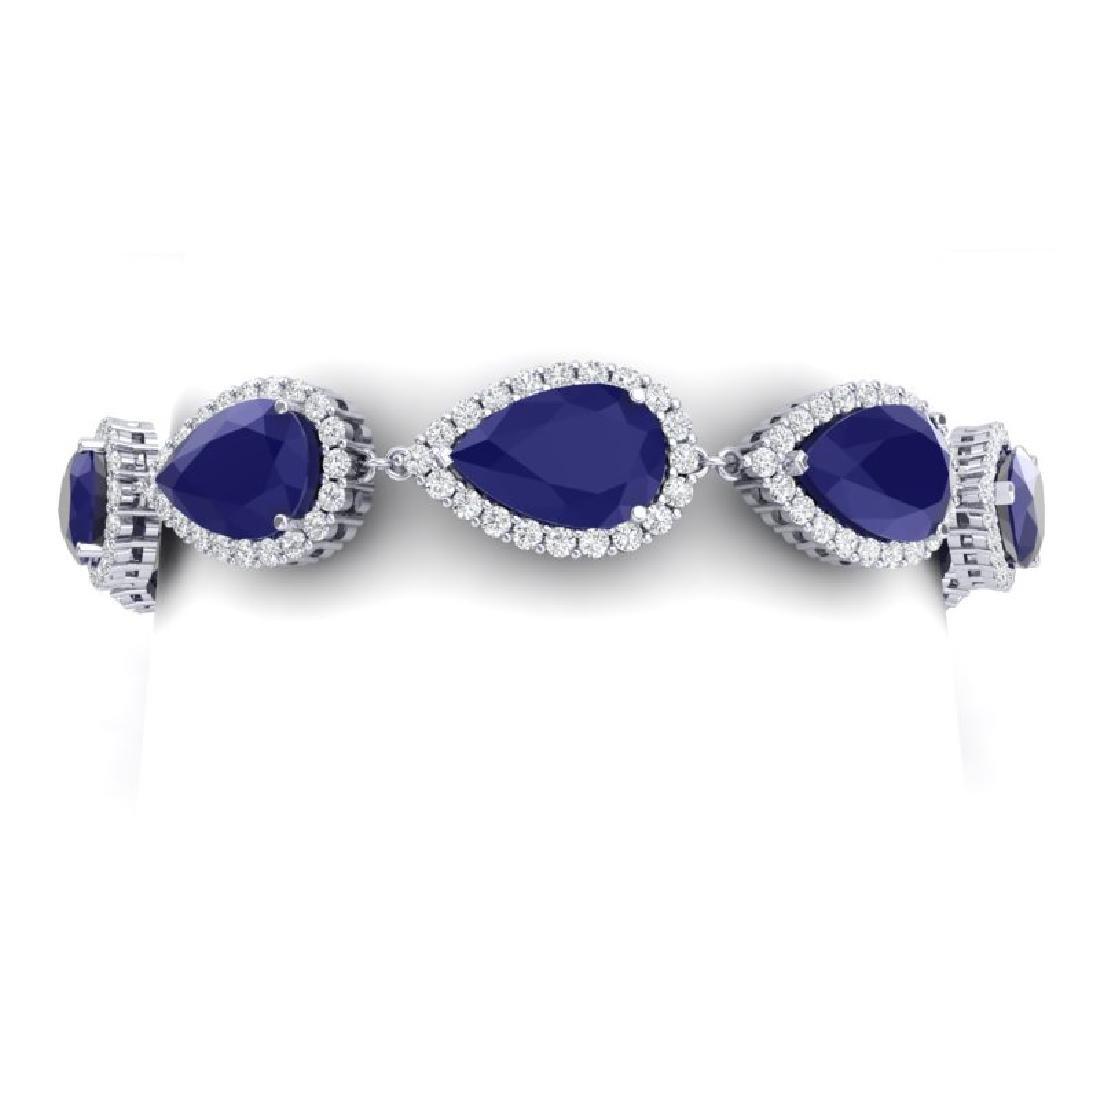 42 CTW Royalty Sapphire & VS Diamond Bracelet 18K White